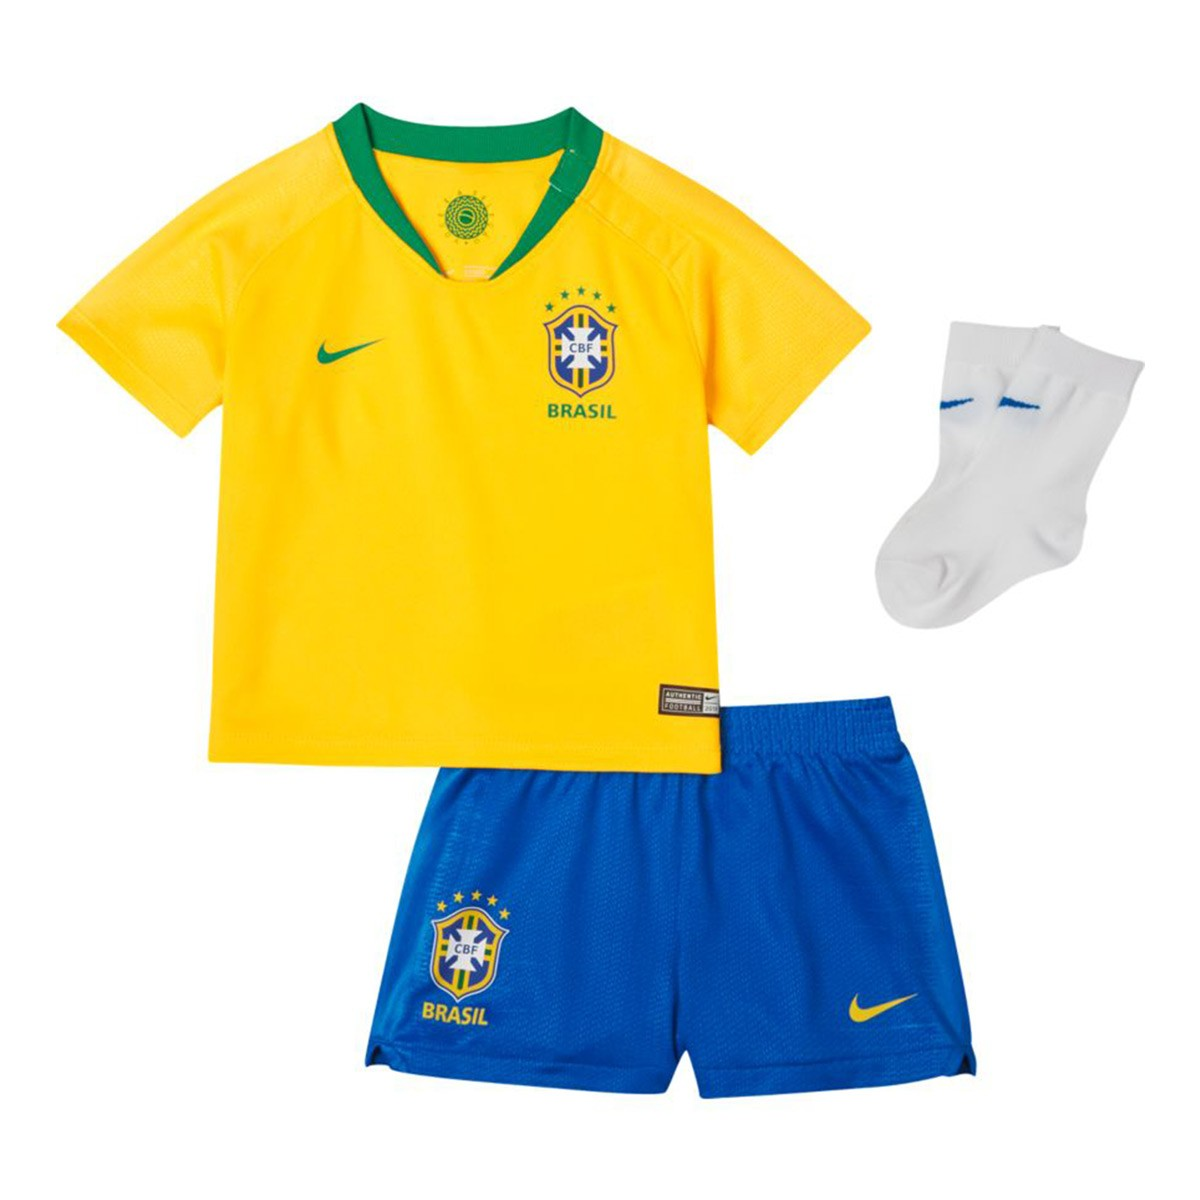 Conjunto Nike Bebé Brasil Breathe Primera Equipación 2018-2019 Midwest  gold-Lucky green - Soloporteros es ahora Fútbol Emotion 4a4339a384d